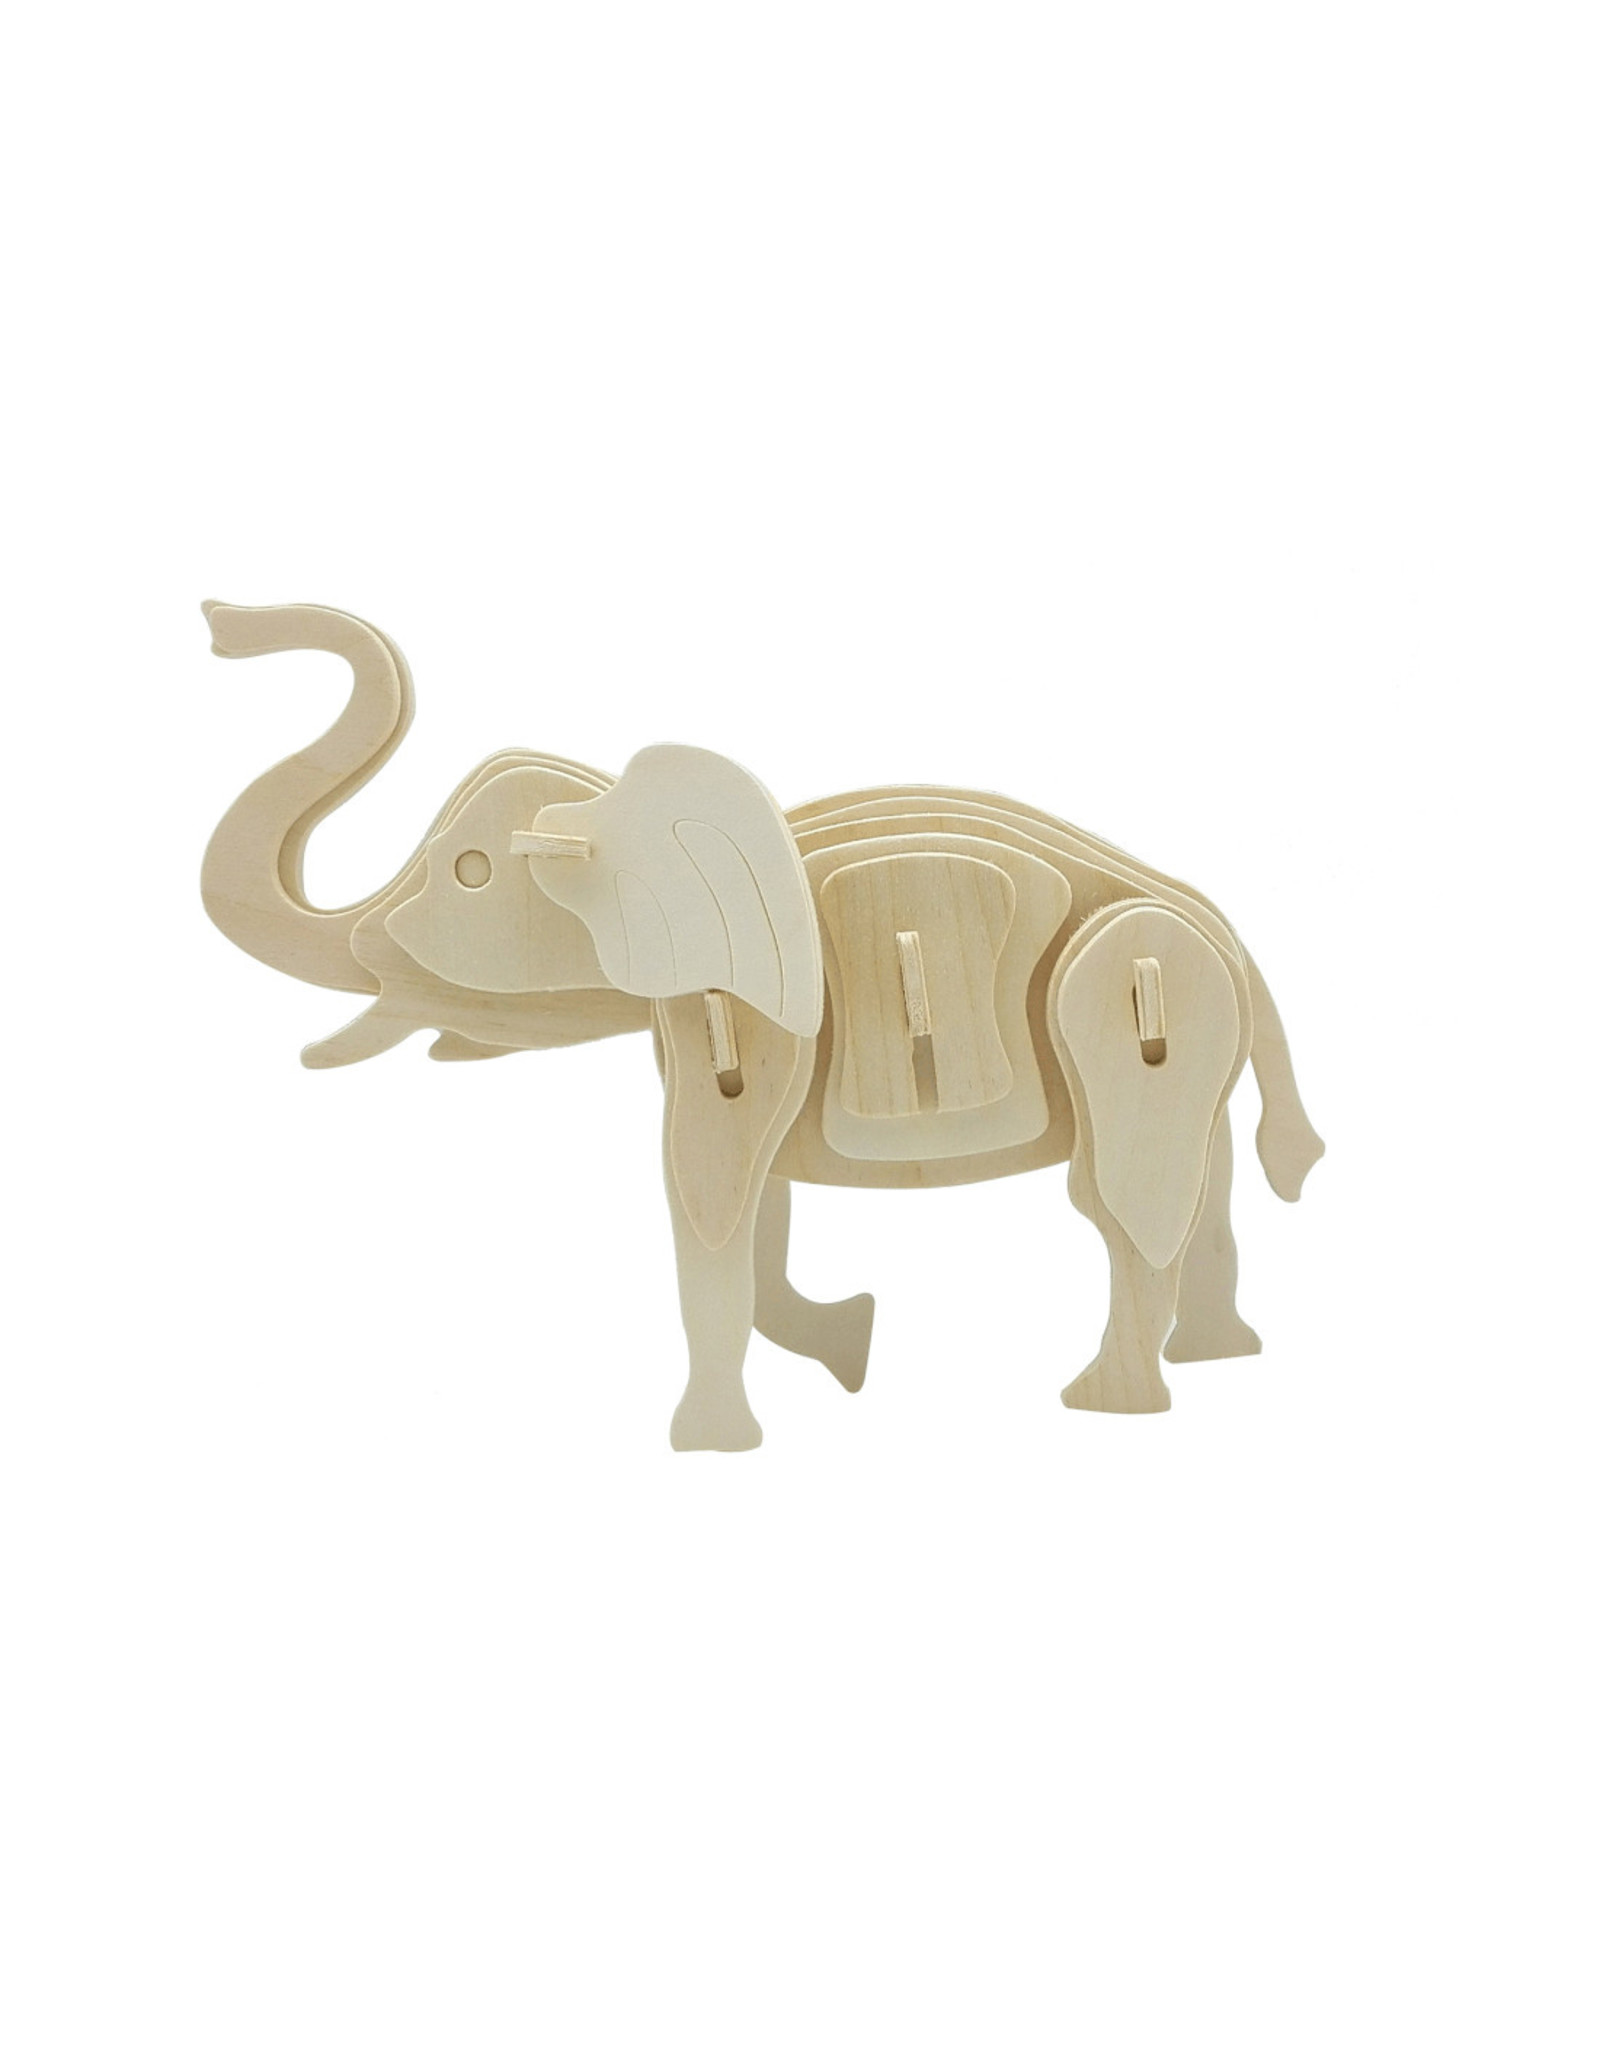 Hands Craft 3D Wooden Puzzle - Elephant